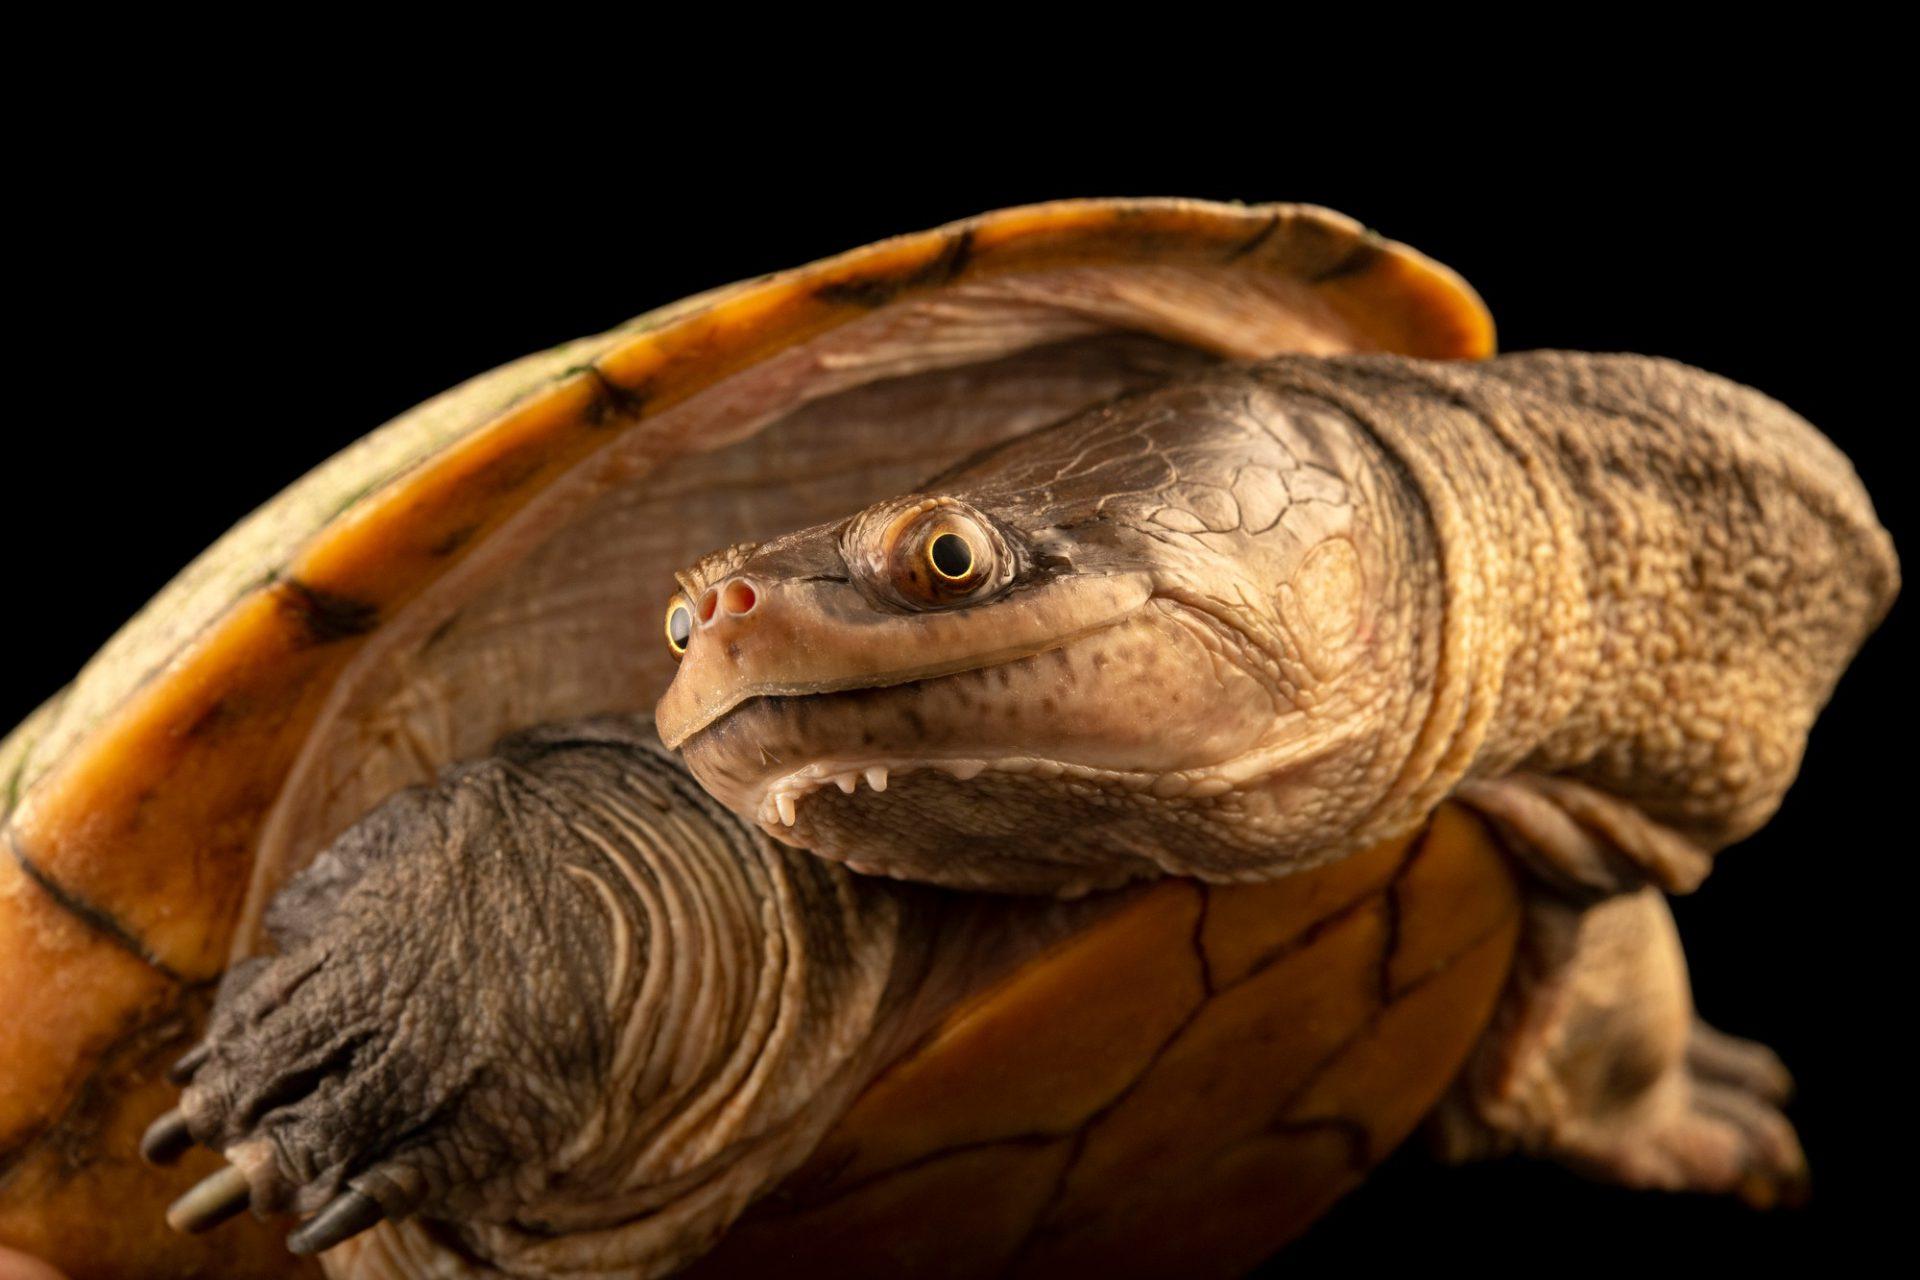 Photo: A critically endangered timor snake-necked turtle (Chelodina mccordi timorensis) at Ragunan Zoo in Jakarta, Indonesia.